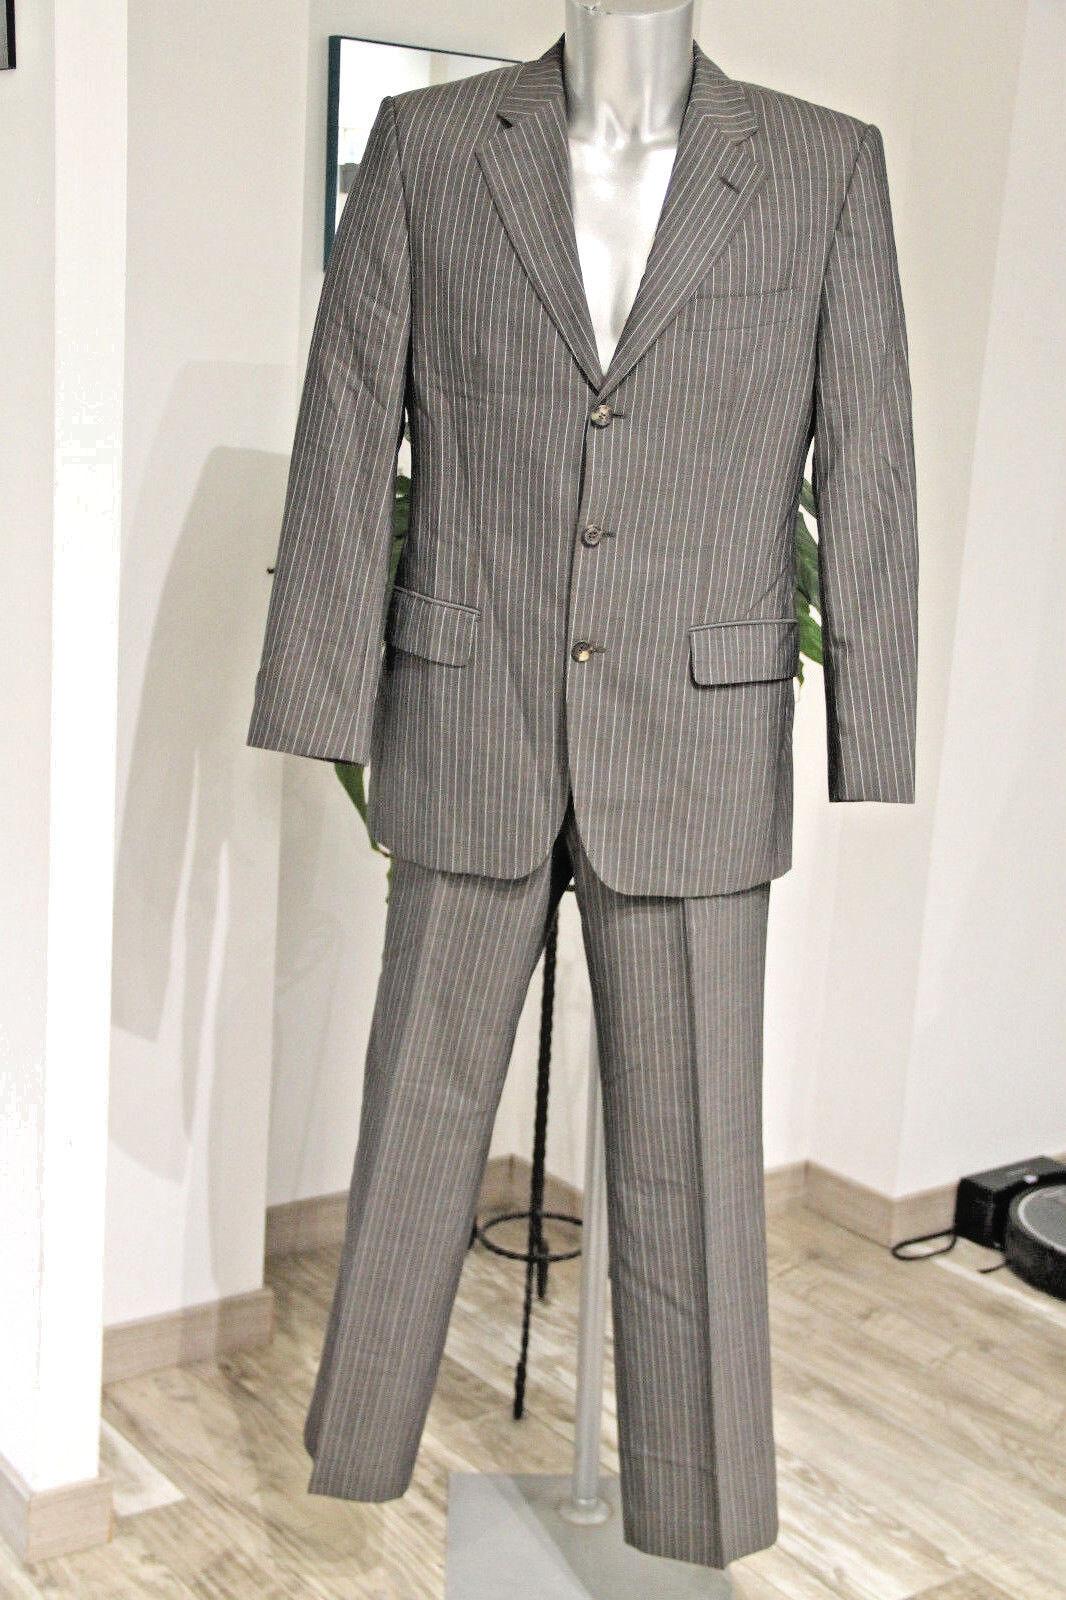 Joli costume marron rayé HUGO BOSS FLYNN/VEGAS Taille 48 soit 44 français